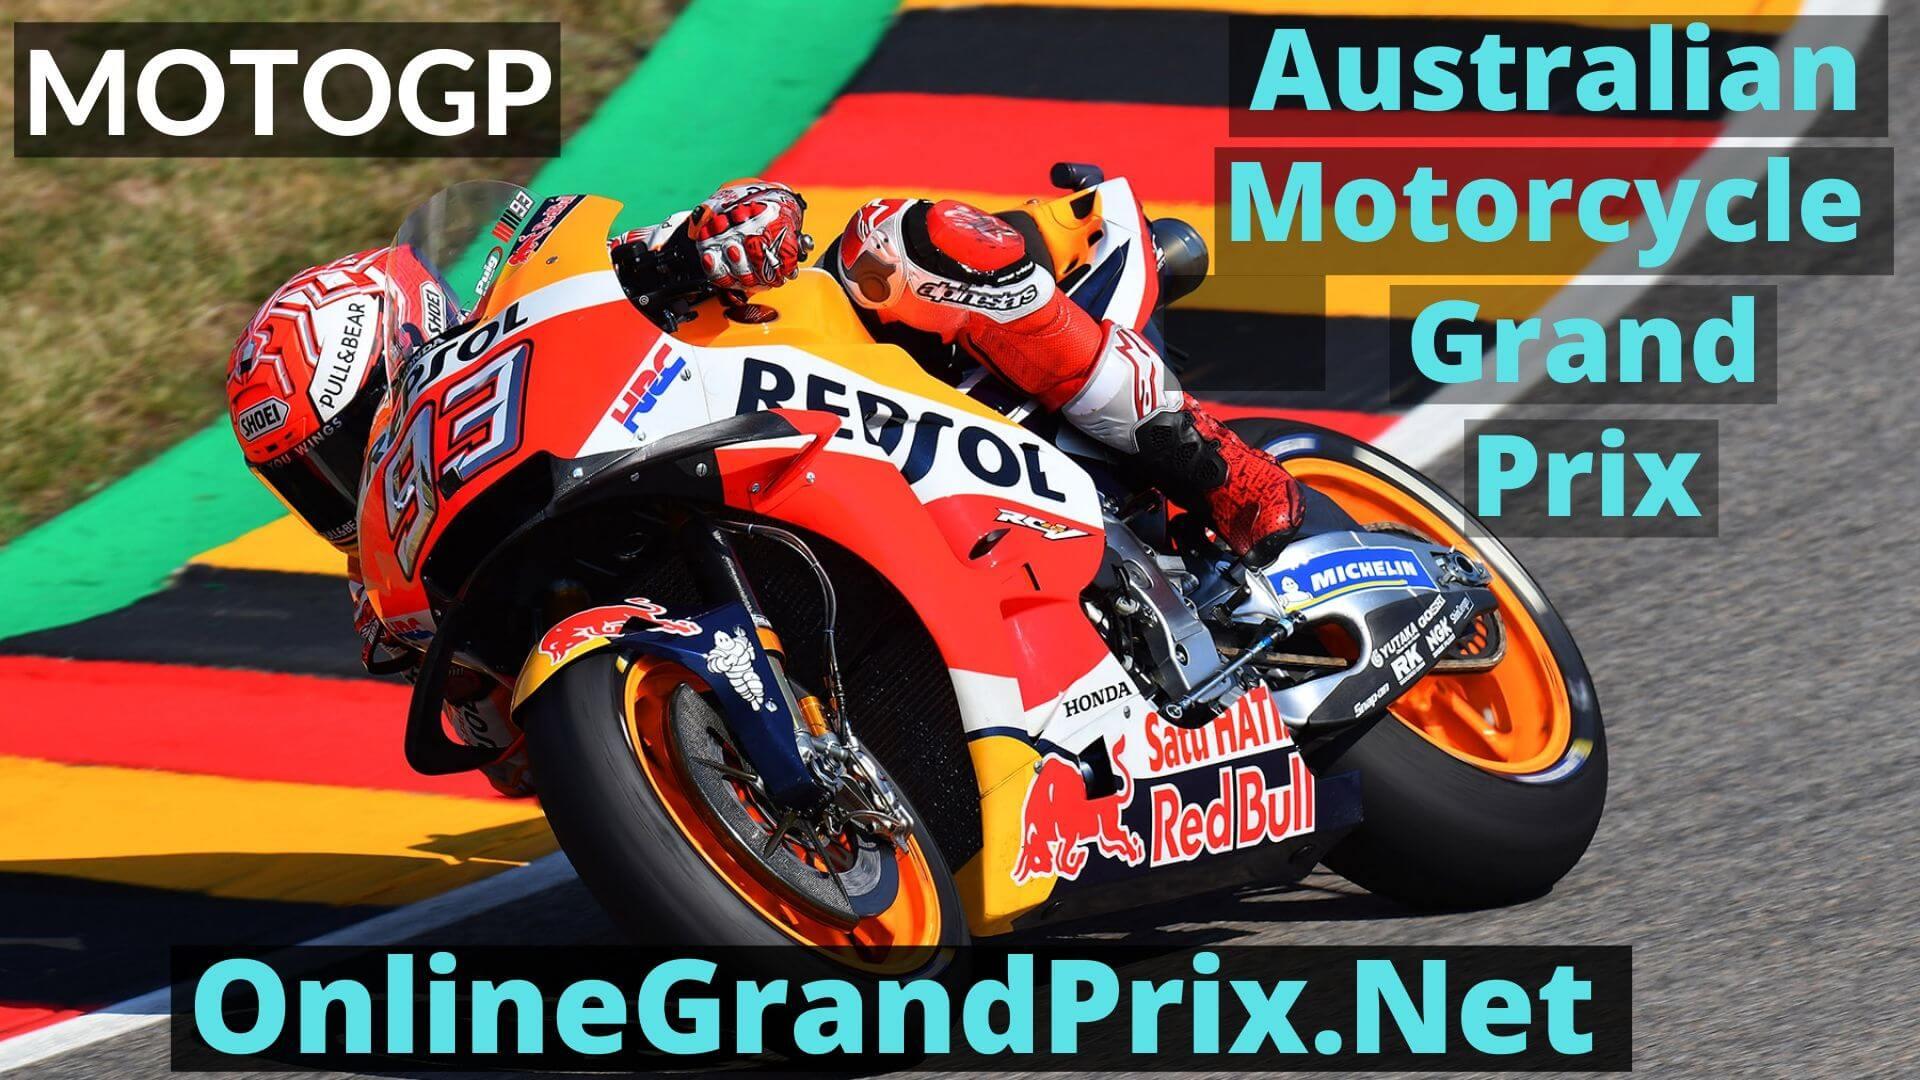 Australian Motorcycle Grand Prix Live Stream 2020 | MotoGP